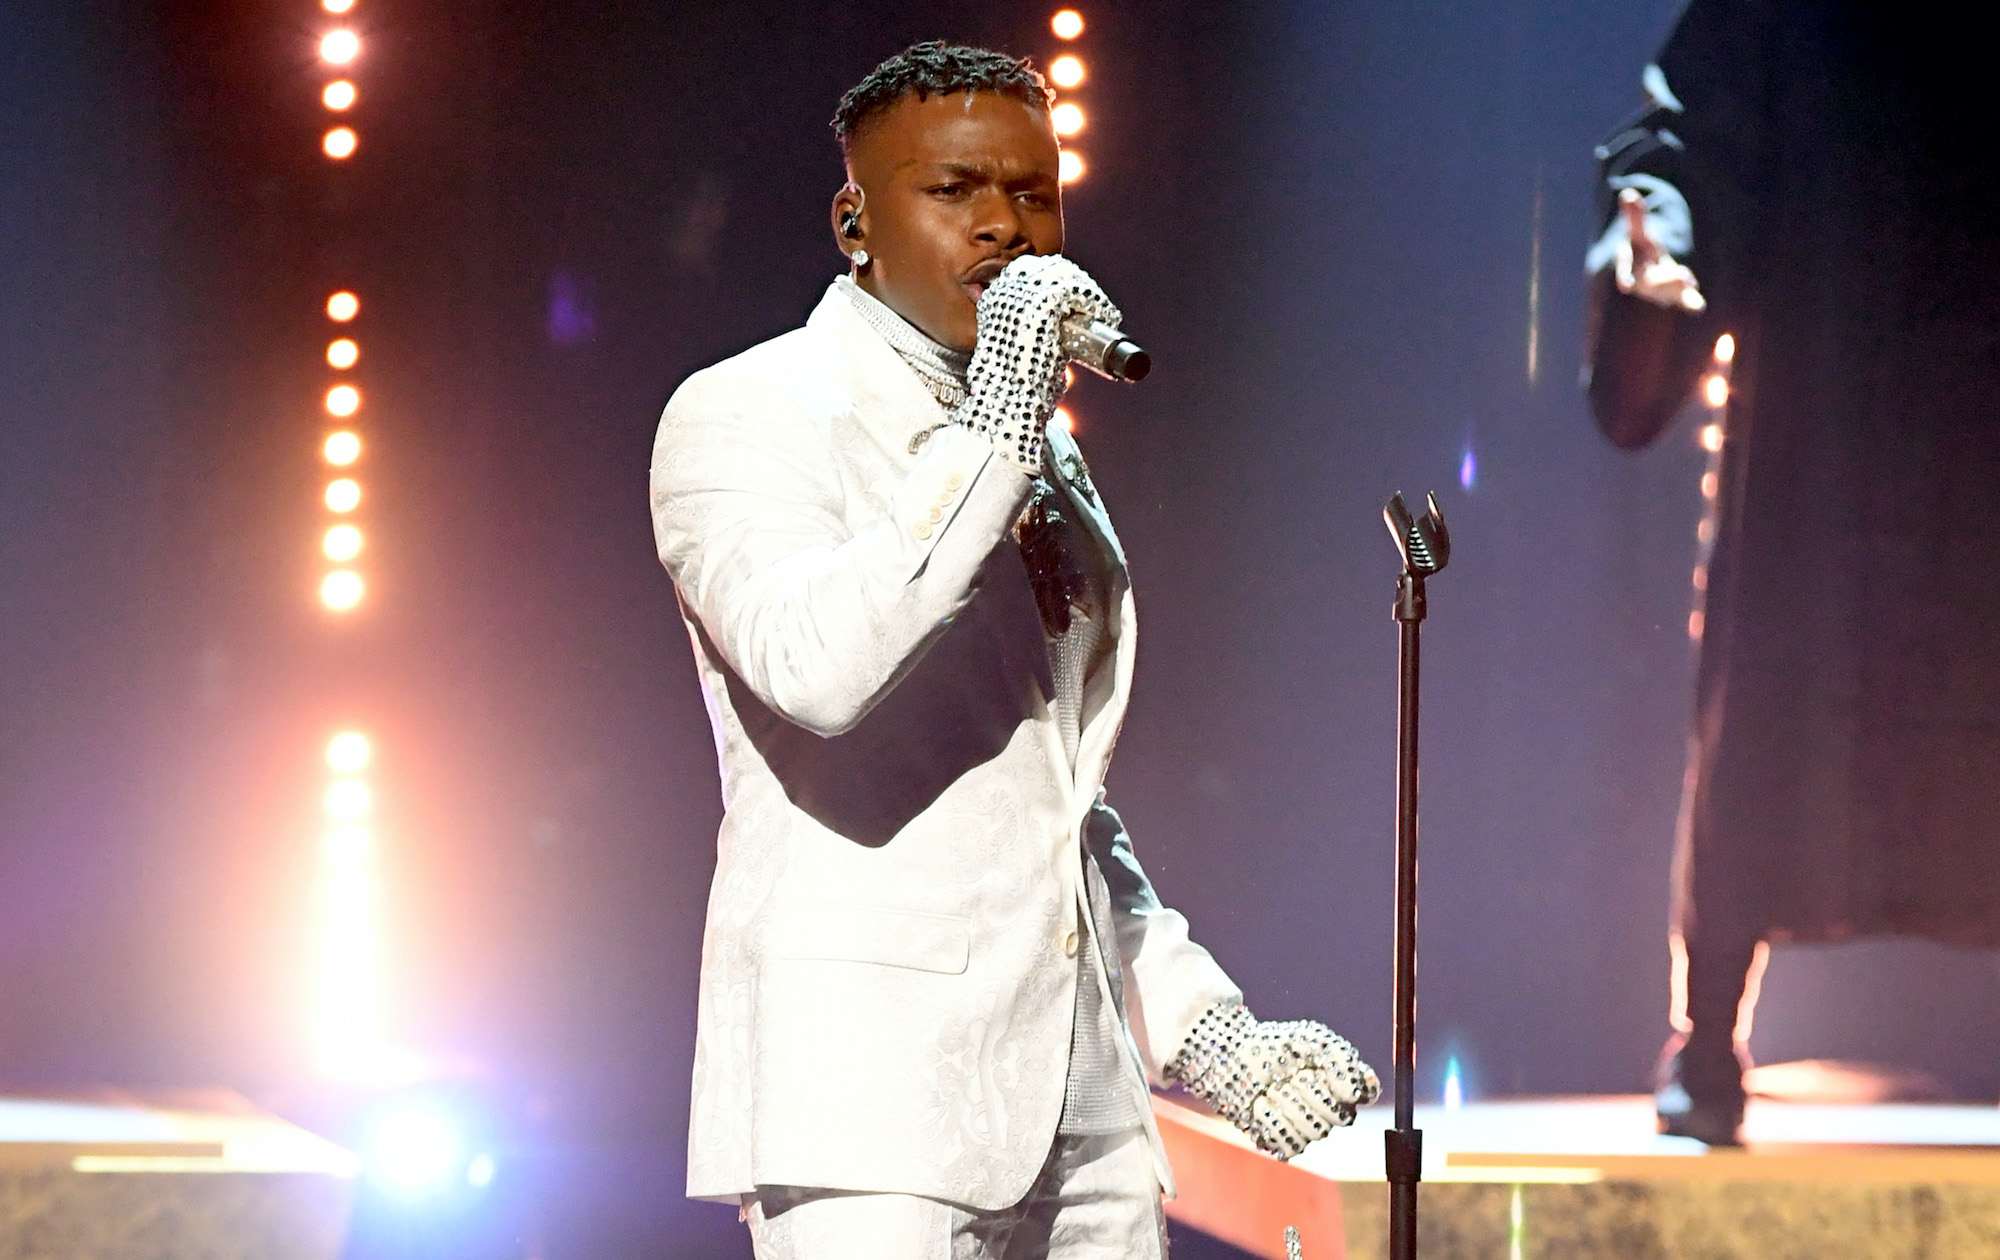 Watch DaBaby's glamorous Grammys performance of 'Rockstar'